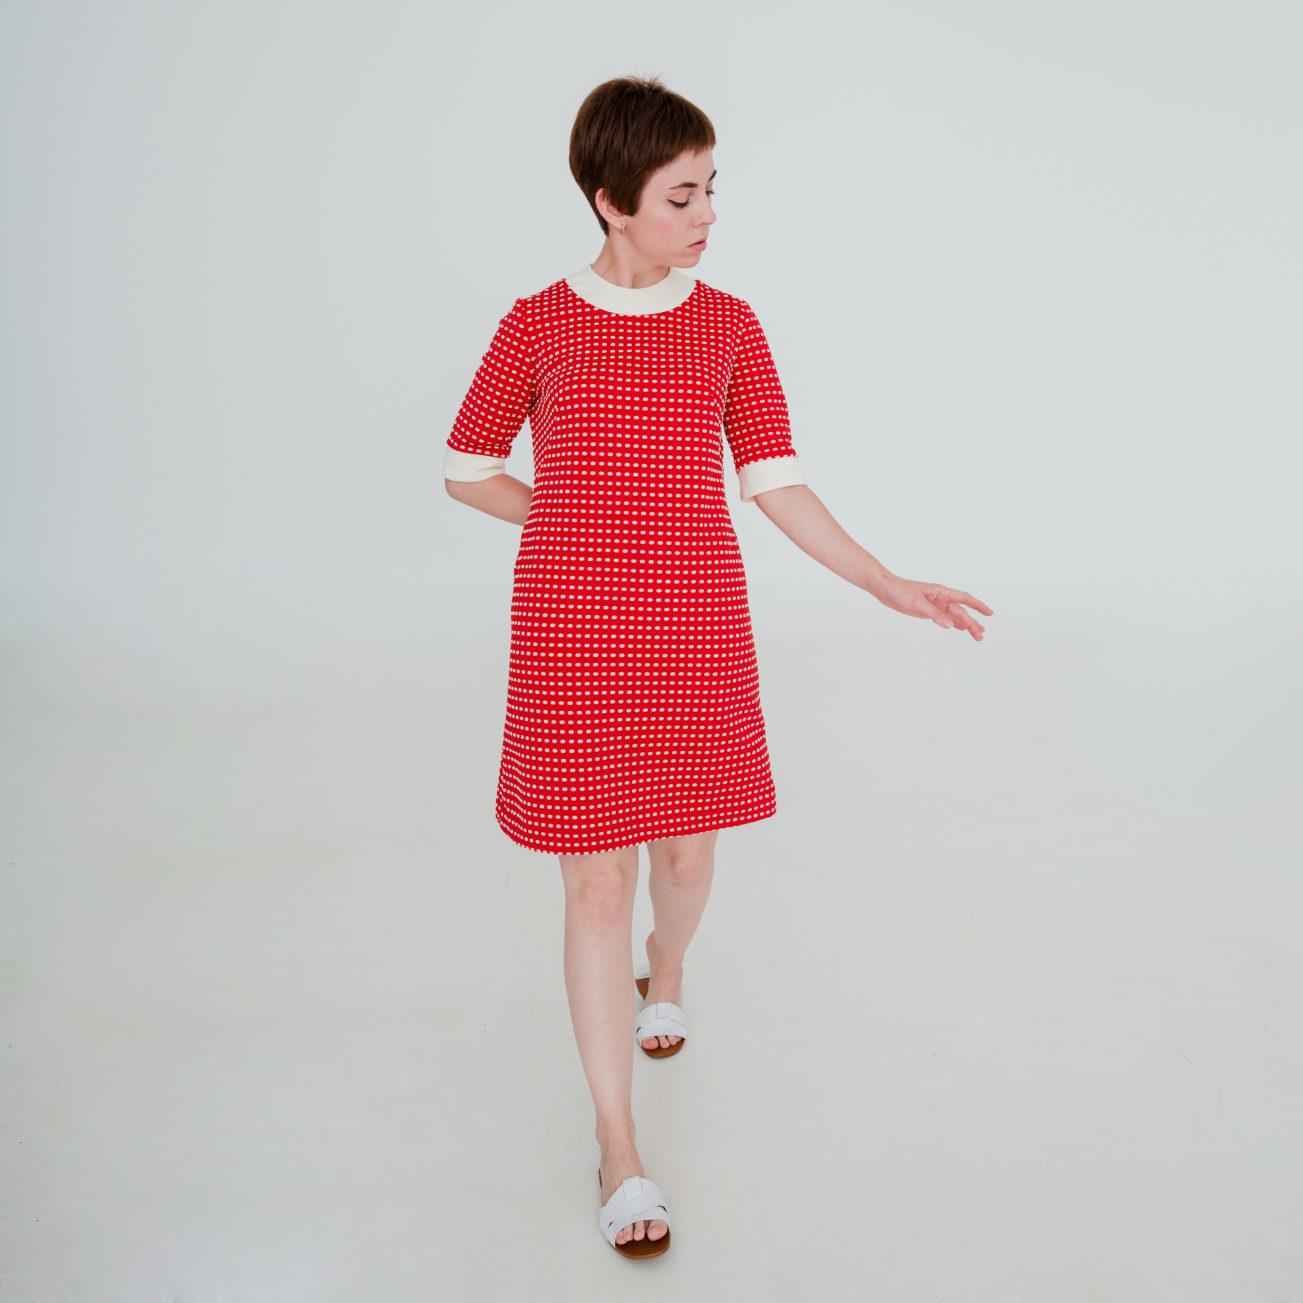 Mod Moddet 60s dress